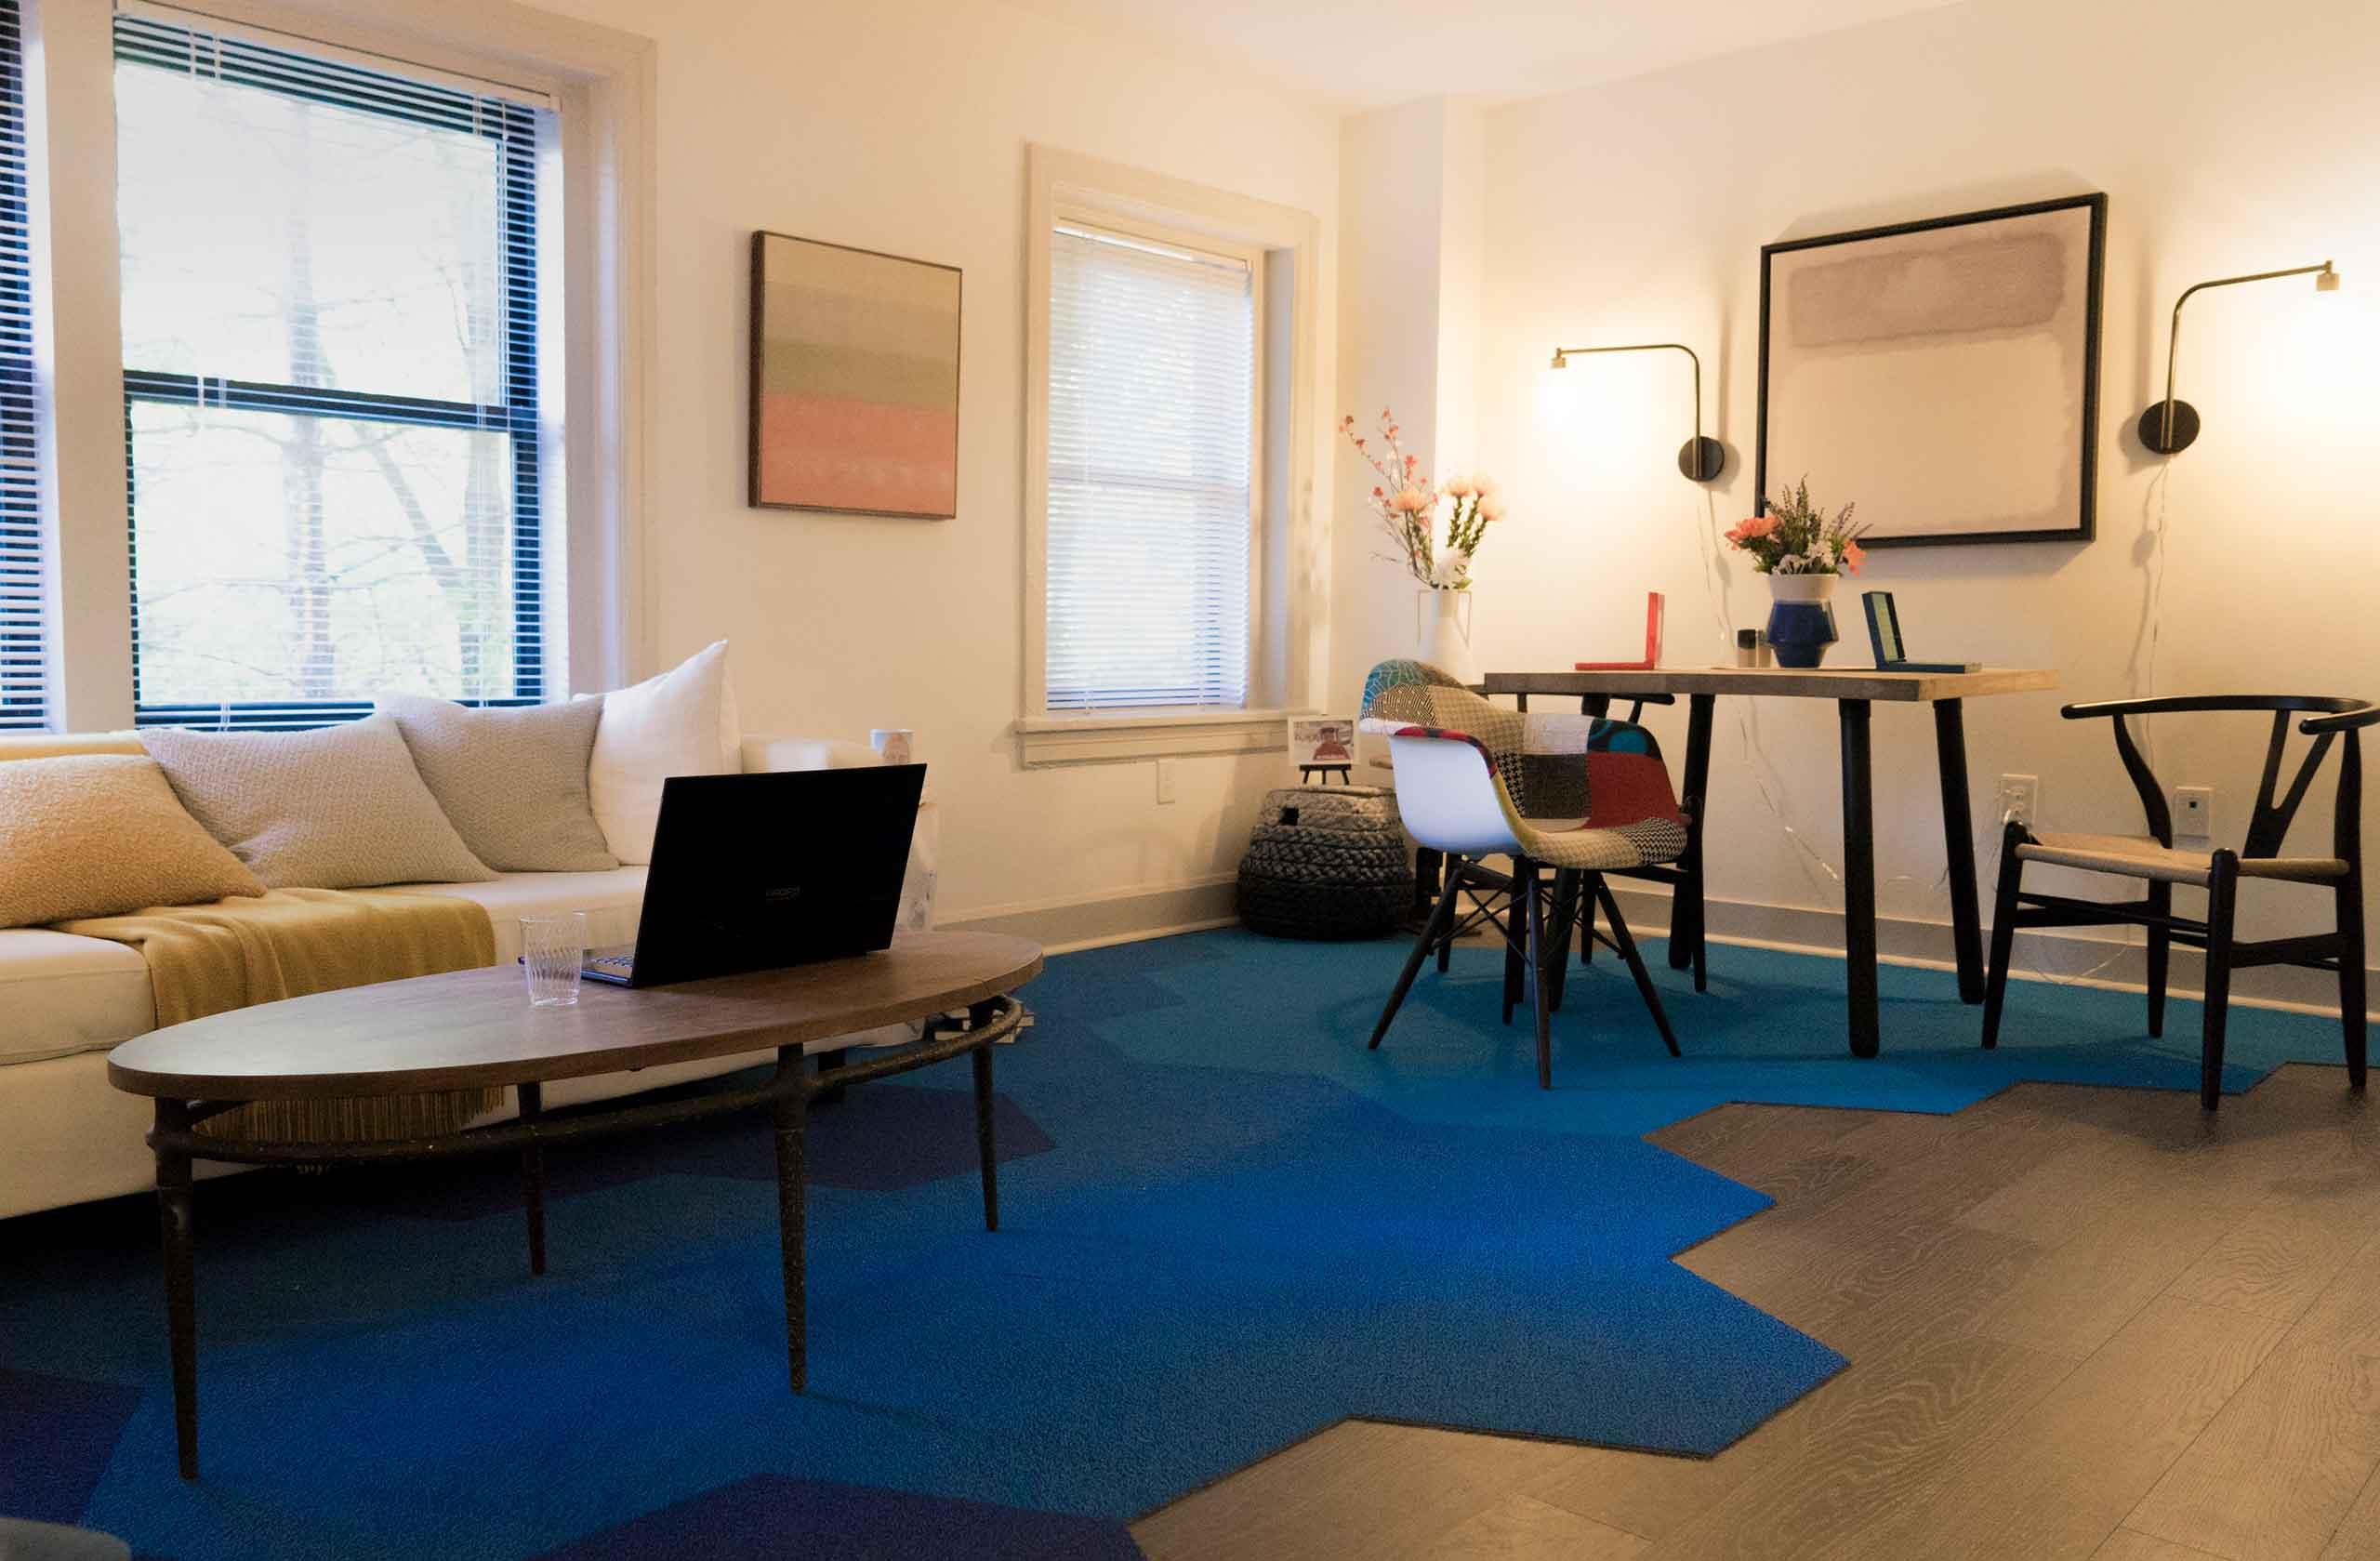 Newbern-Apartments-Family-Room